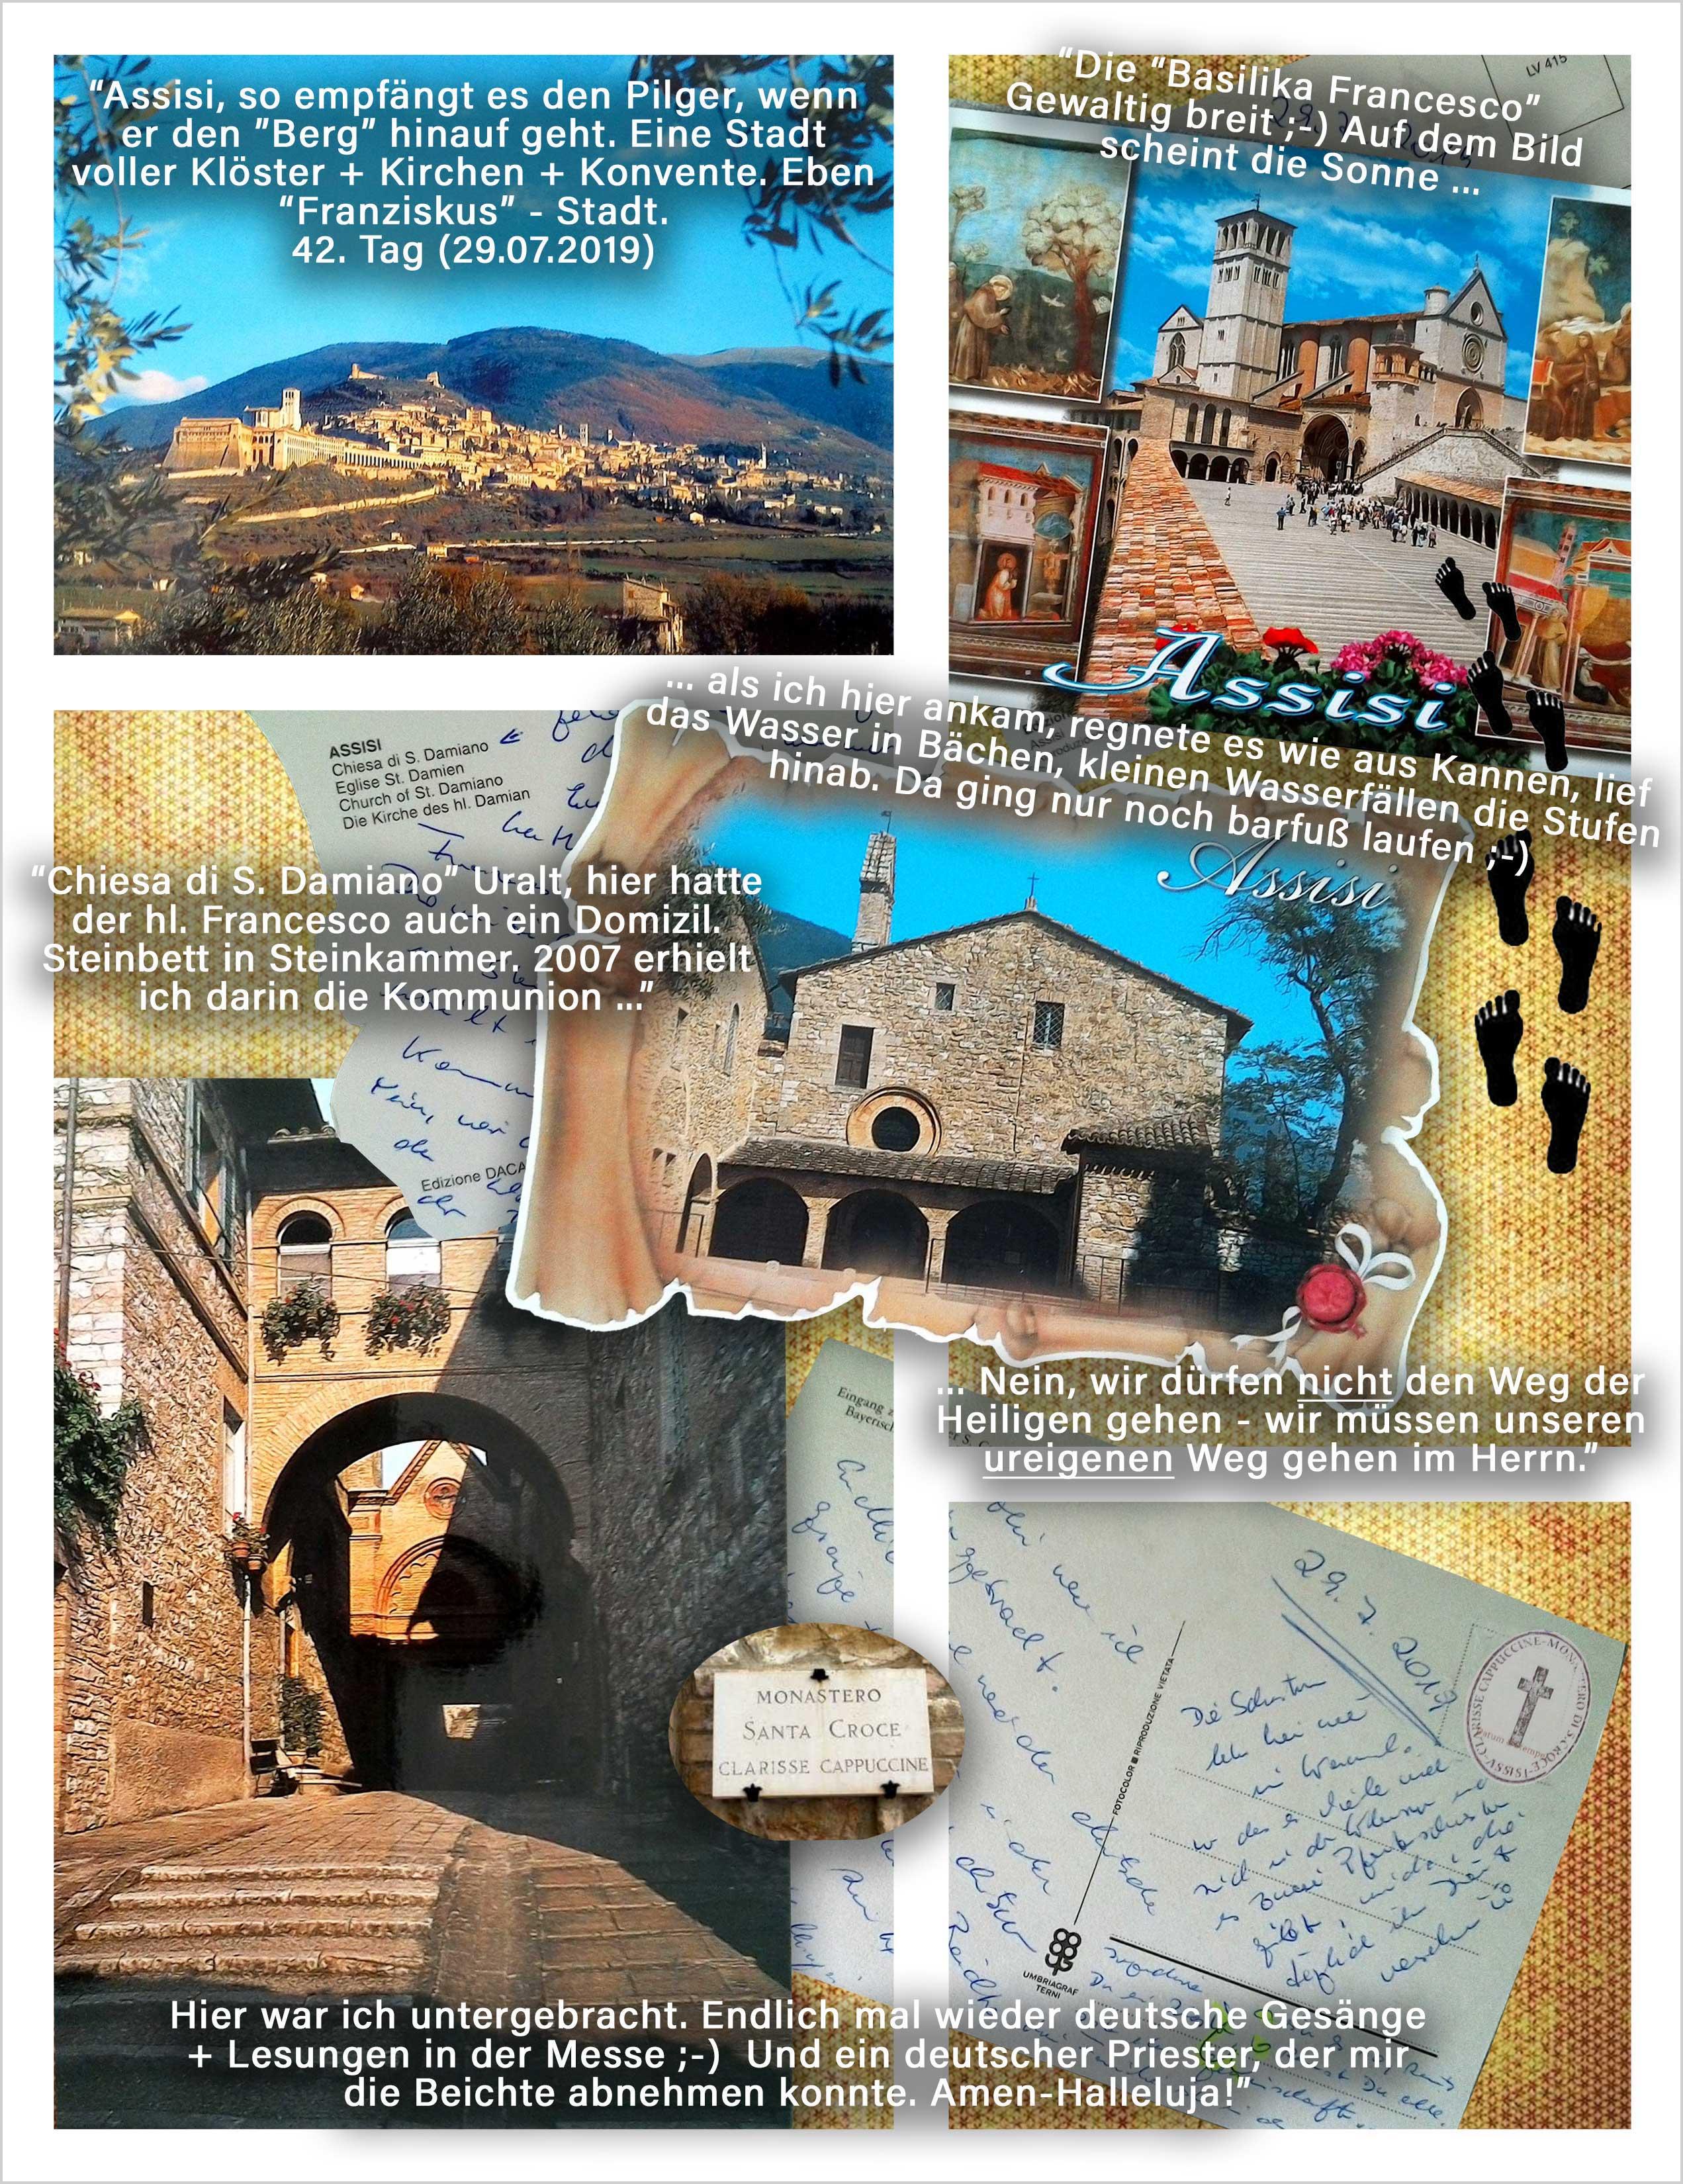 assisi-basilika-francesco-chiesa-di-s-damiano-zweite-pilgerreise-zu-fuss-nach-rom